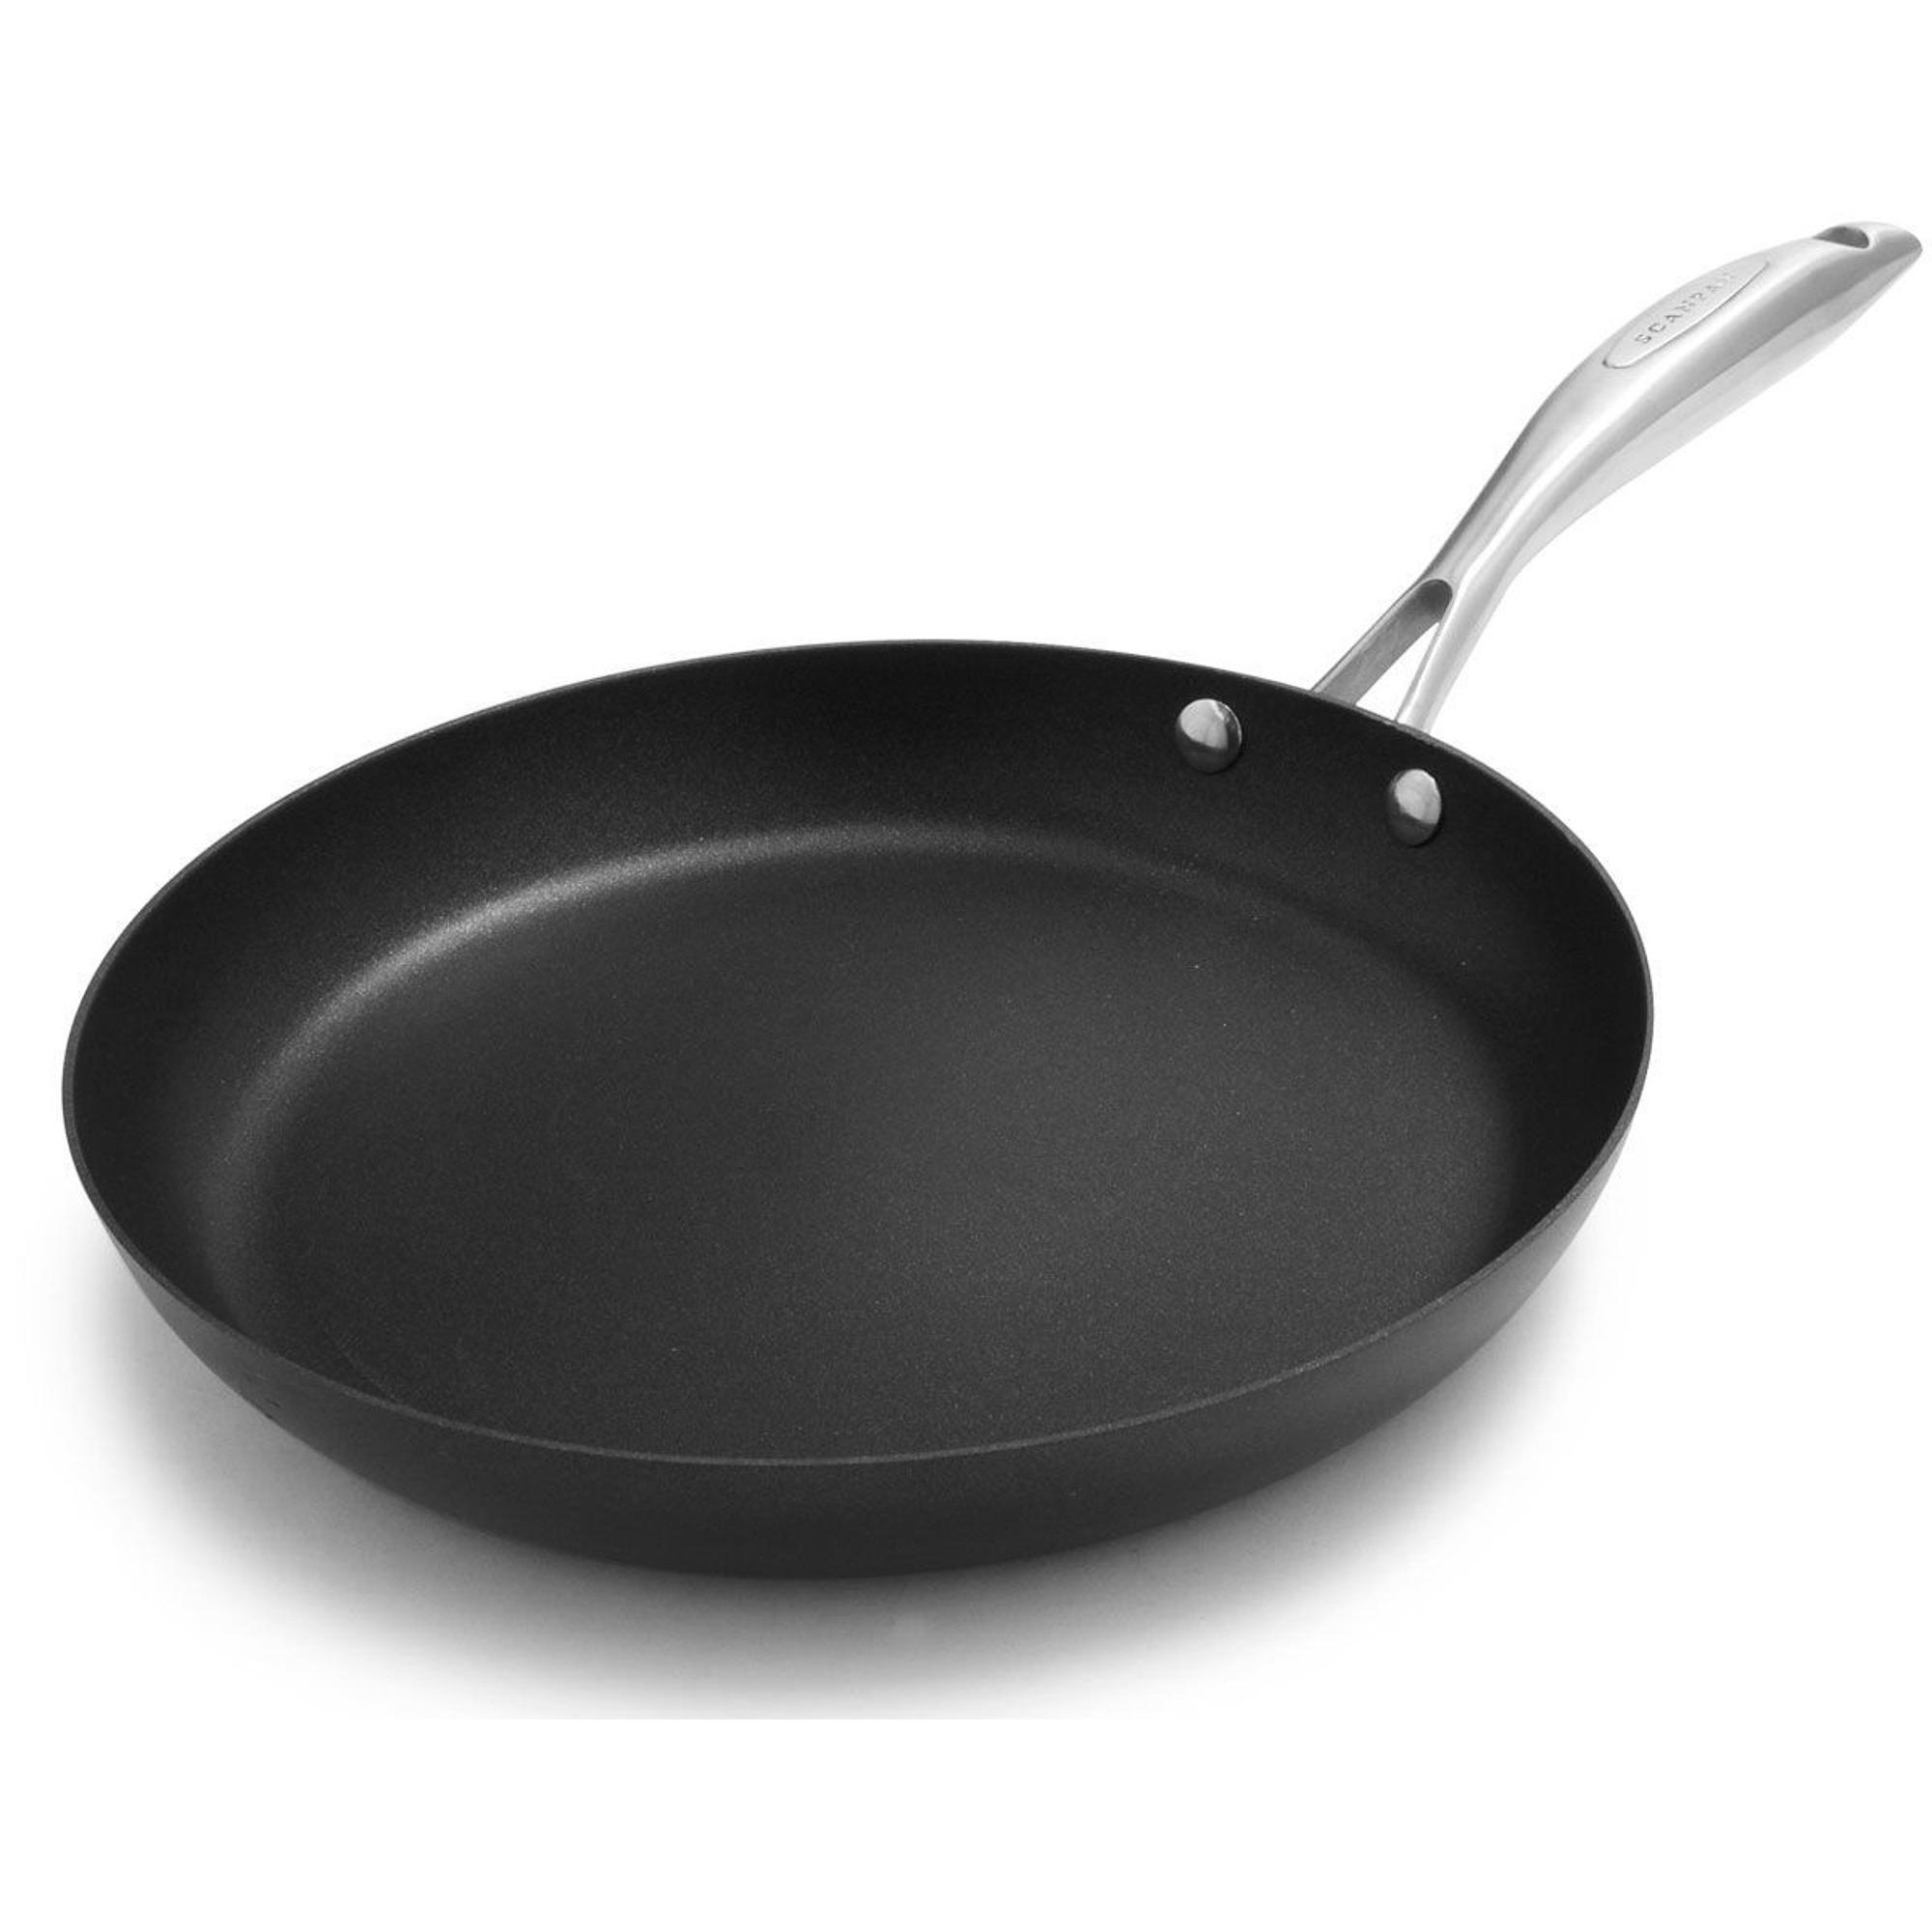 Сковорода Scanpan Pro IQ 26 см сковорода гриль scanpan pro iq 27 см